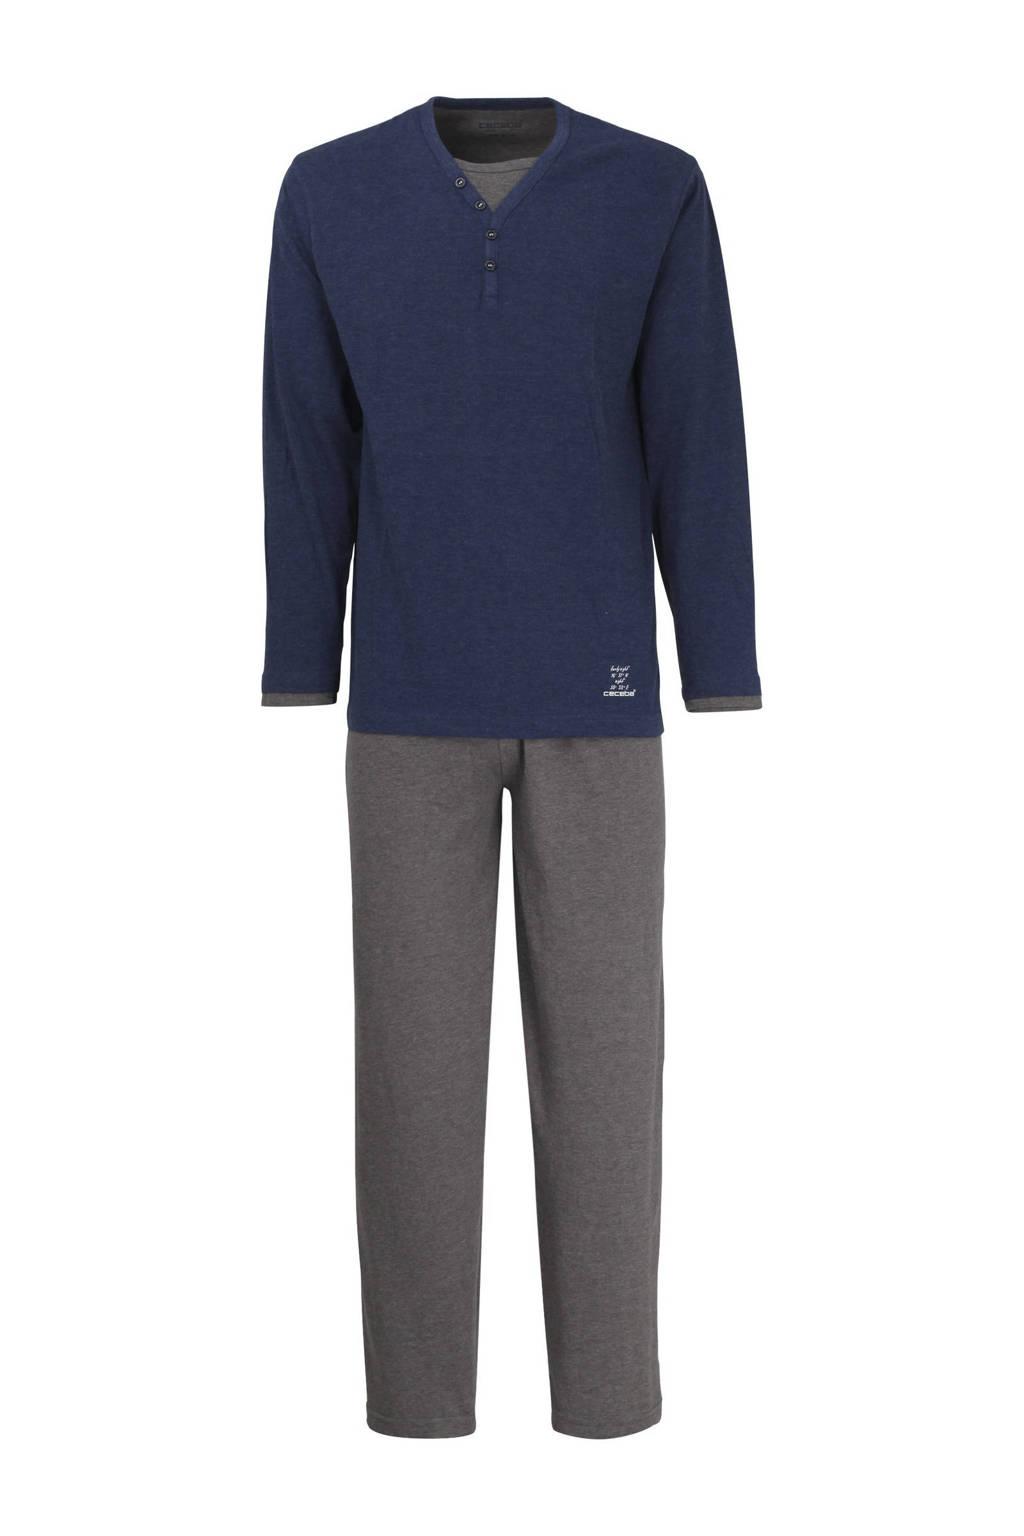 Ceceba pyjama donkerblauw/grijs, Donkerblauw/grijs